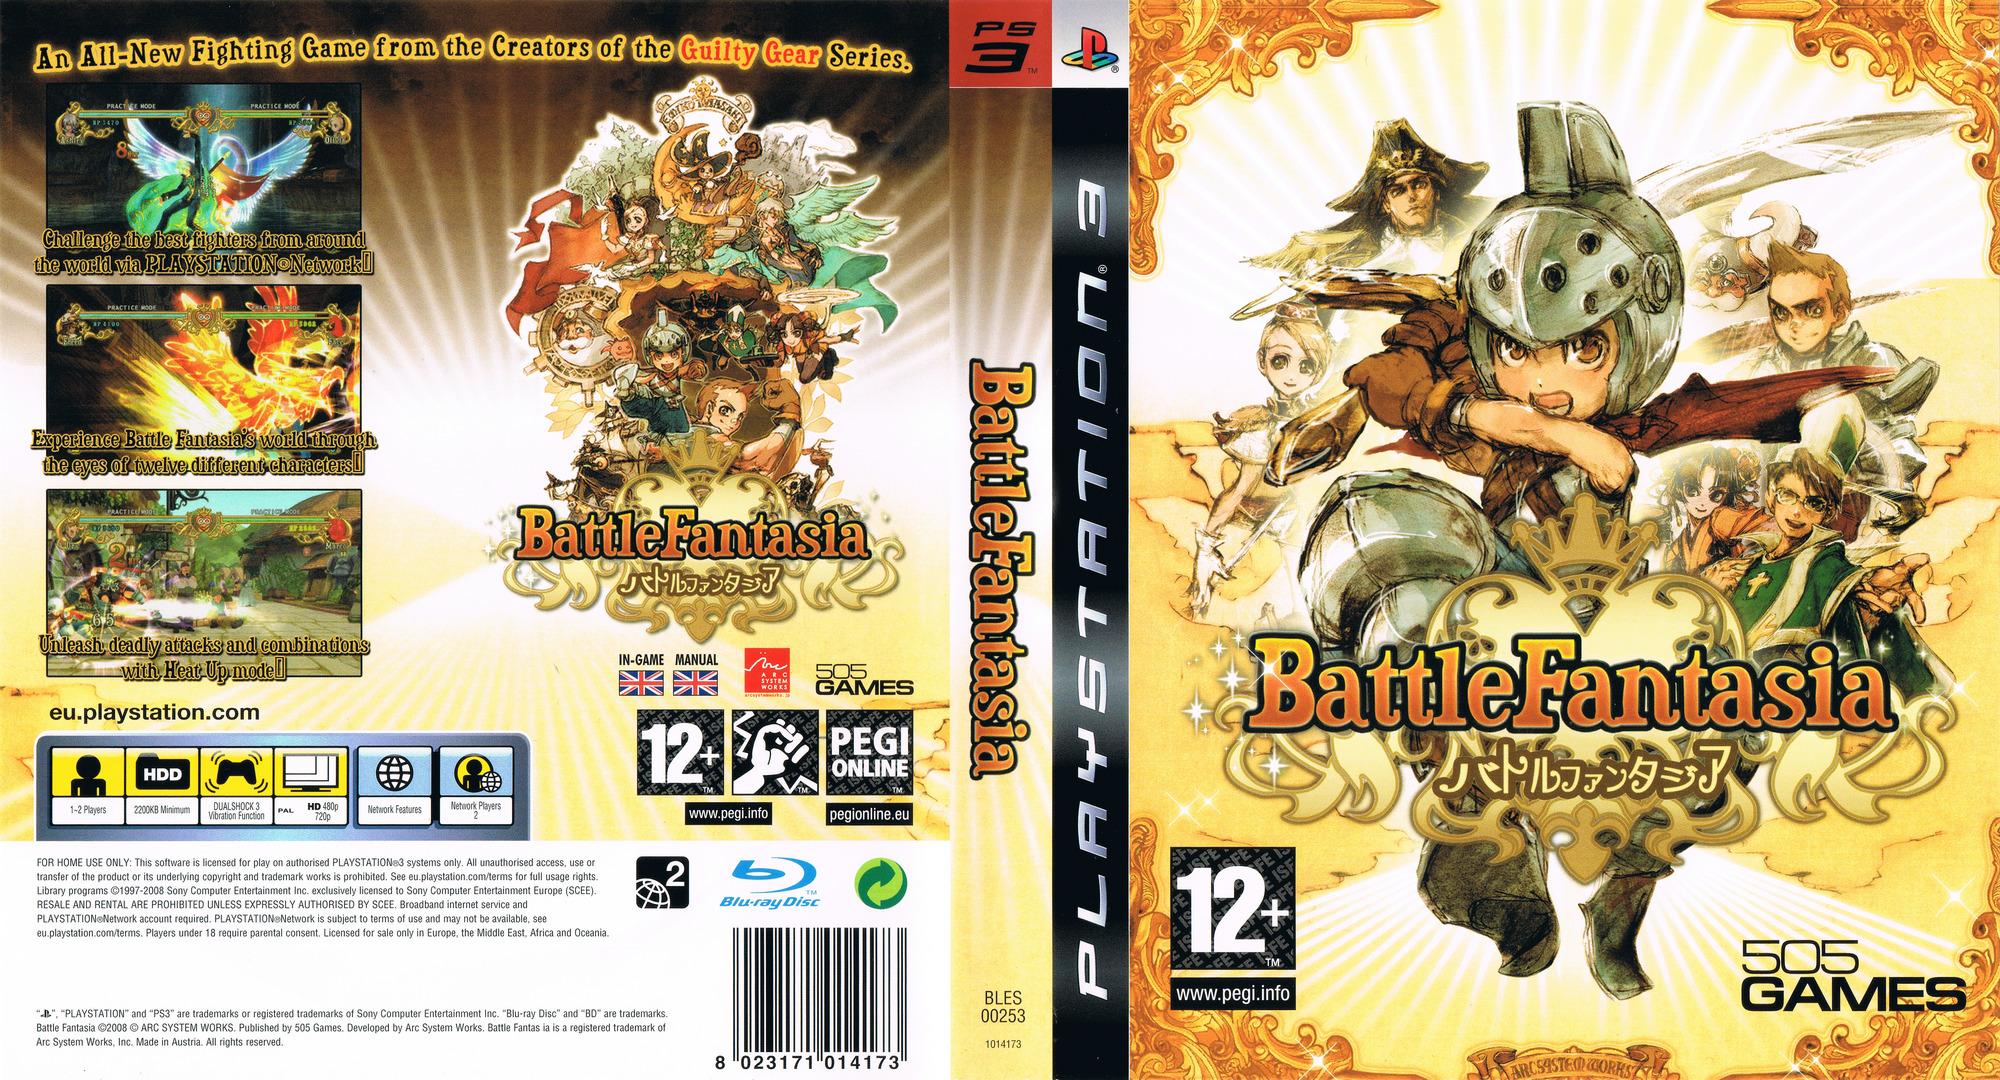 Battle Fantasia PS3 coverfullHQ (BLES00253)